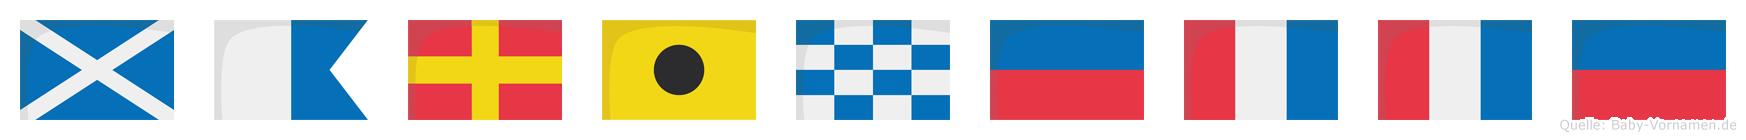 Marinette im Flaggenalphabet